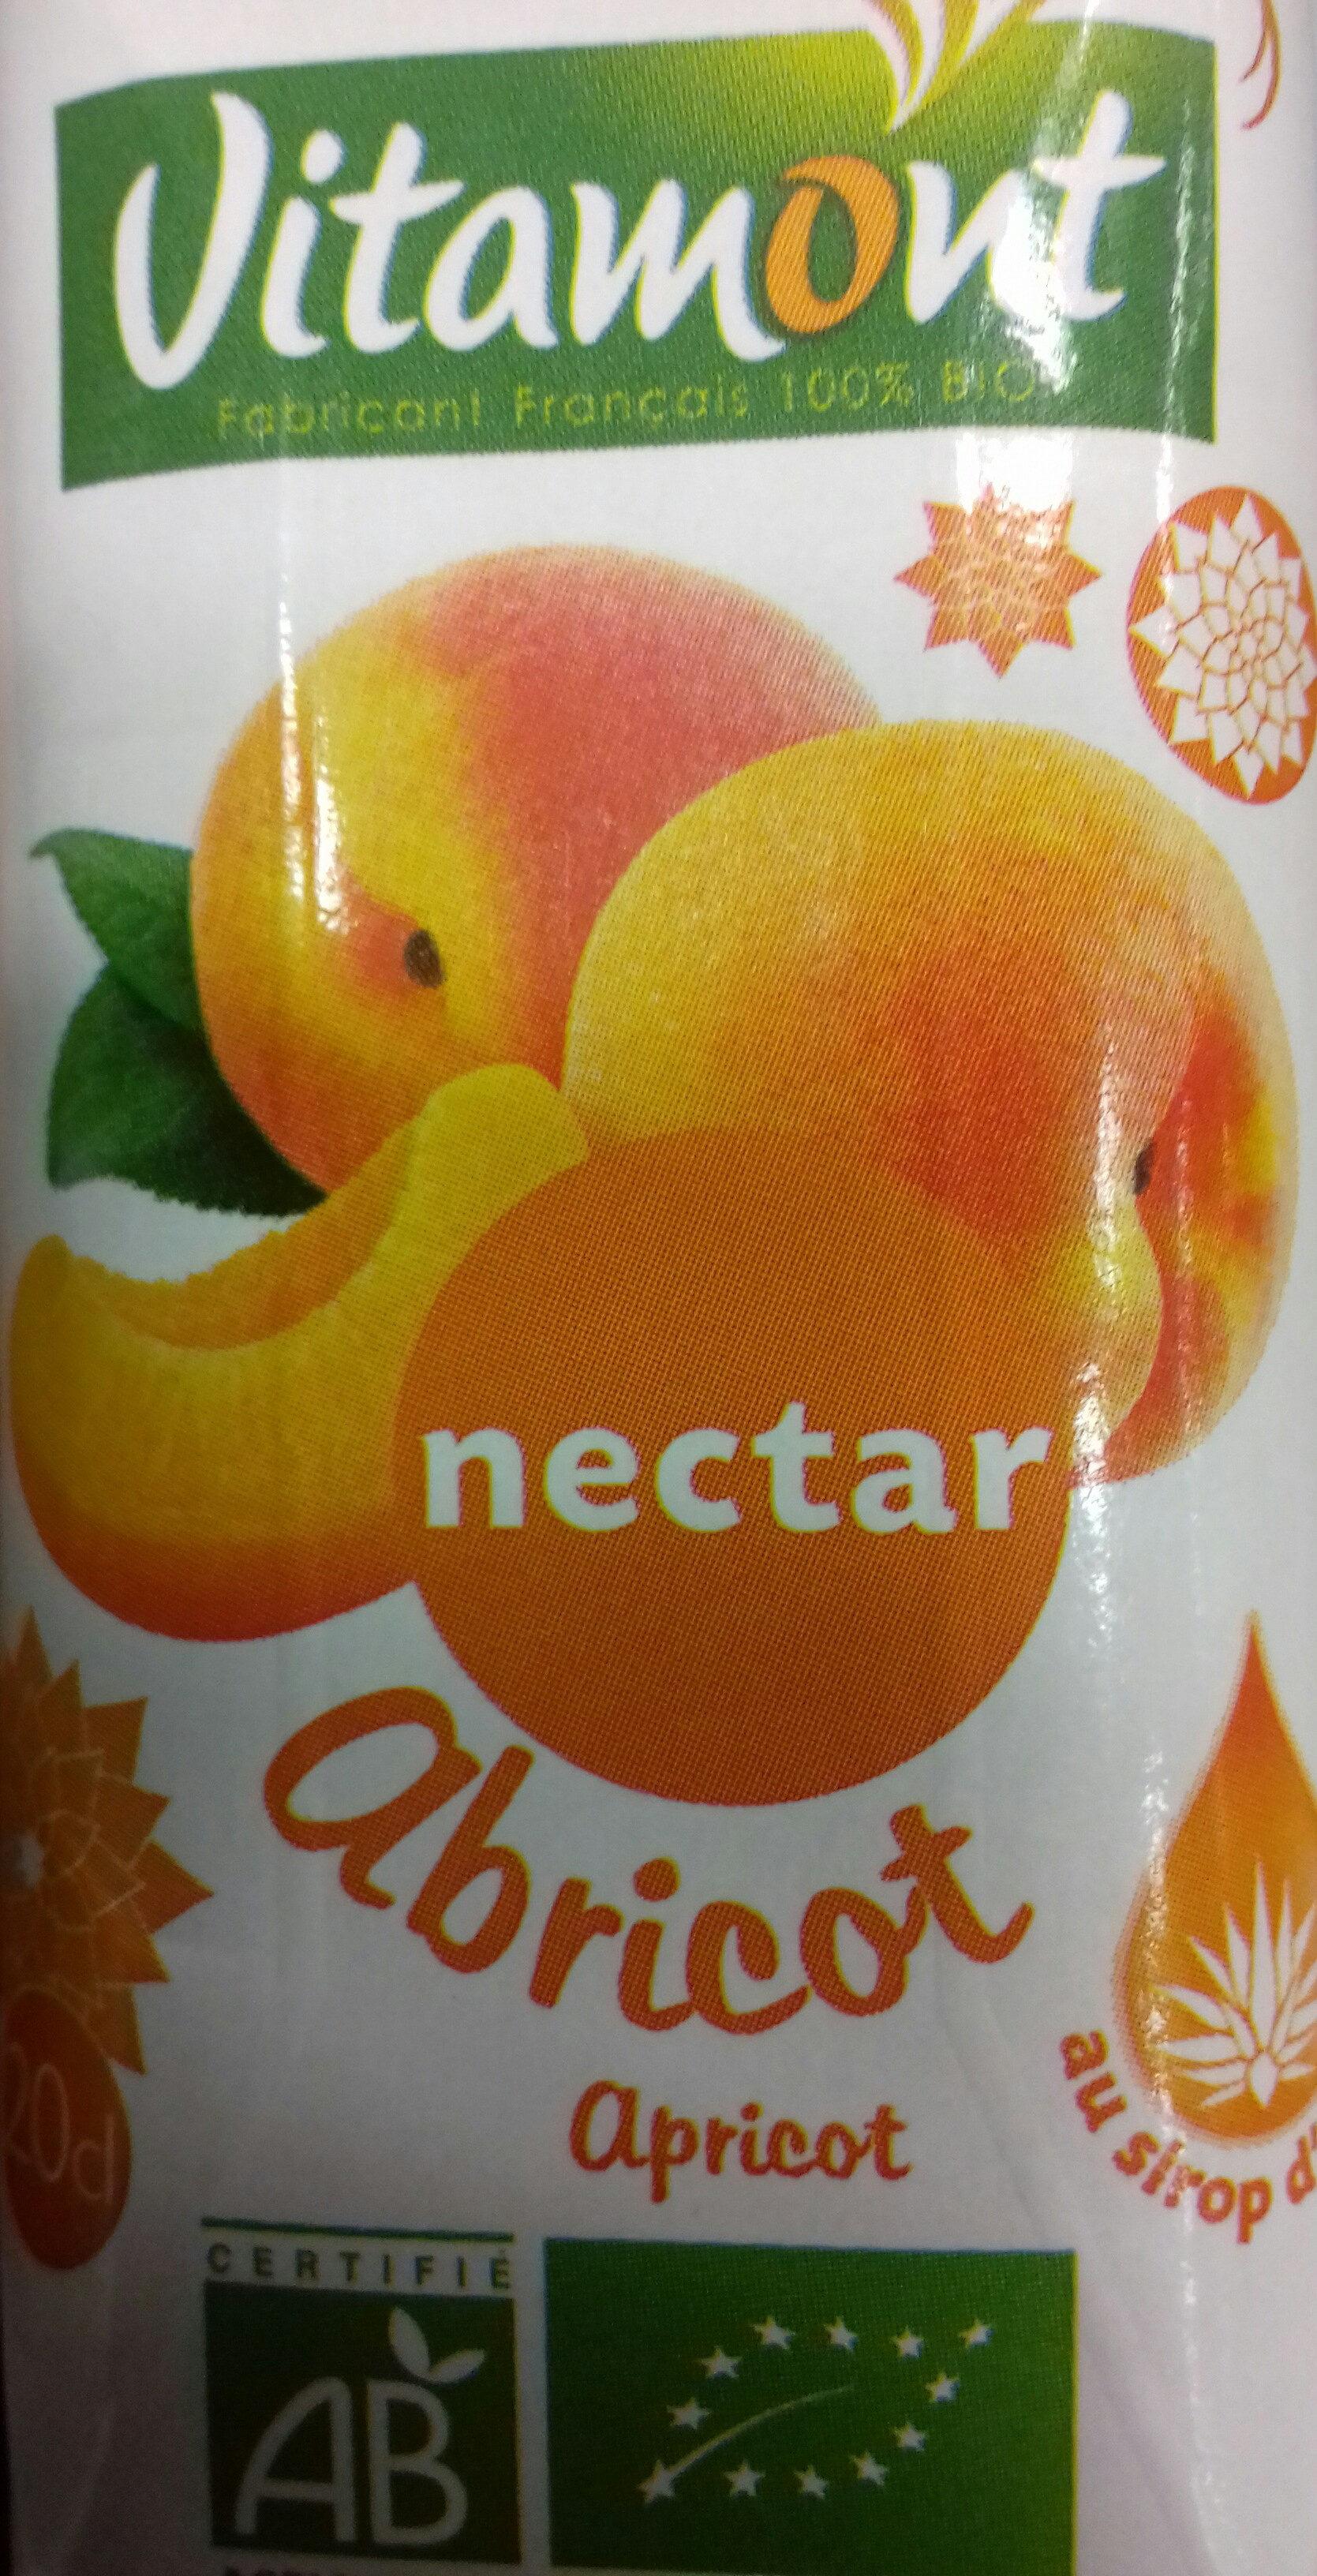 Nectar abricot de france - Produit